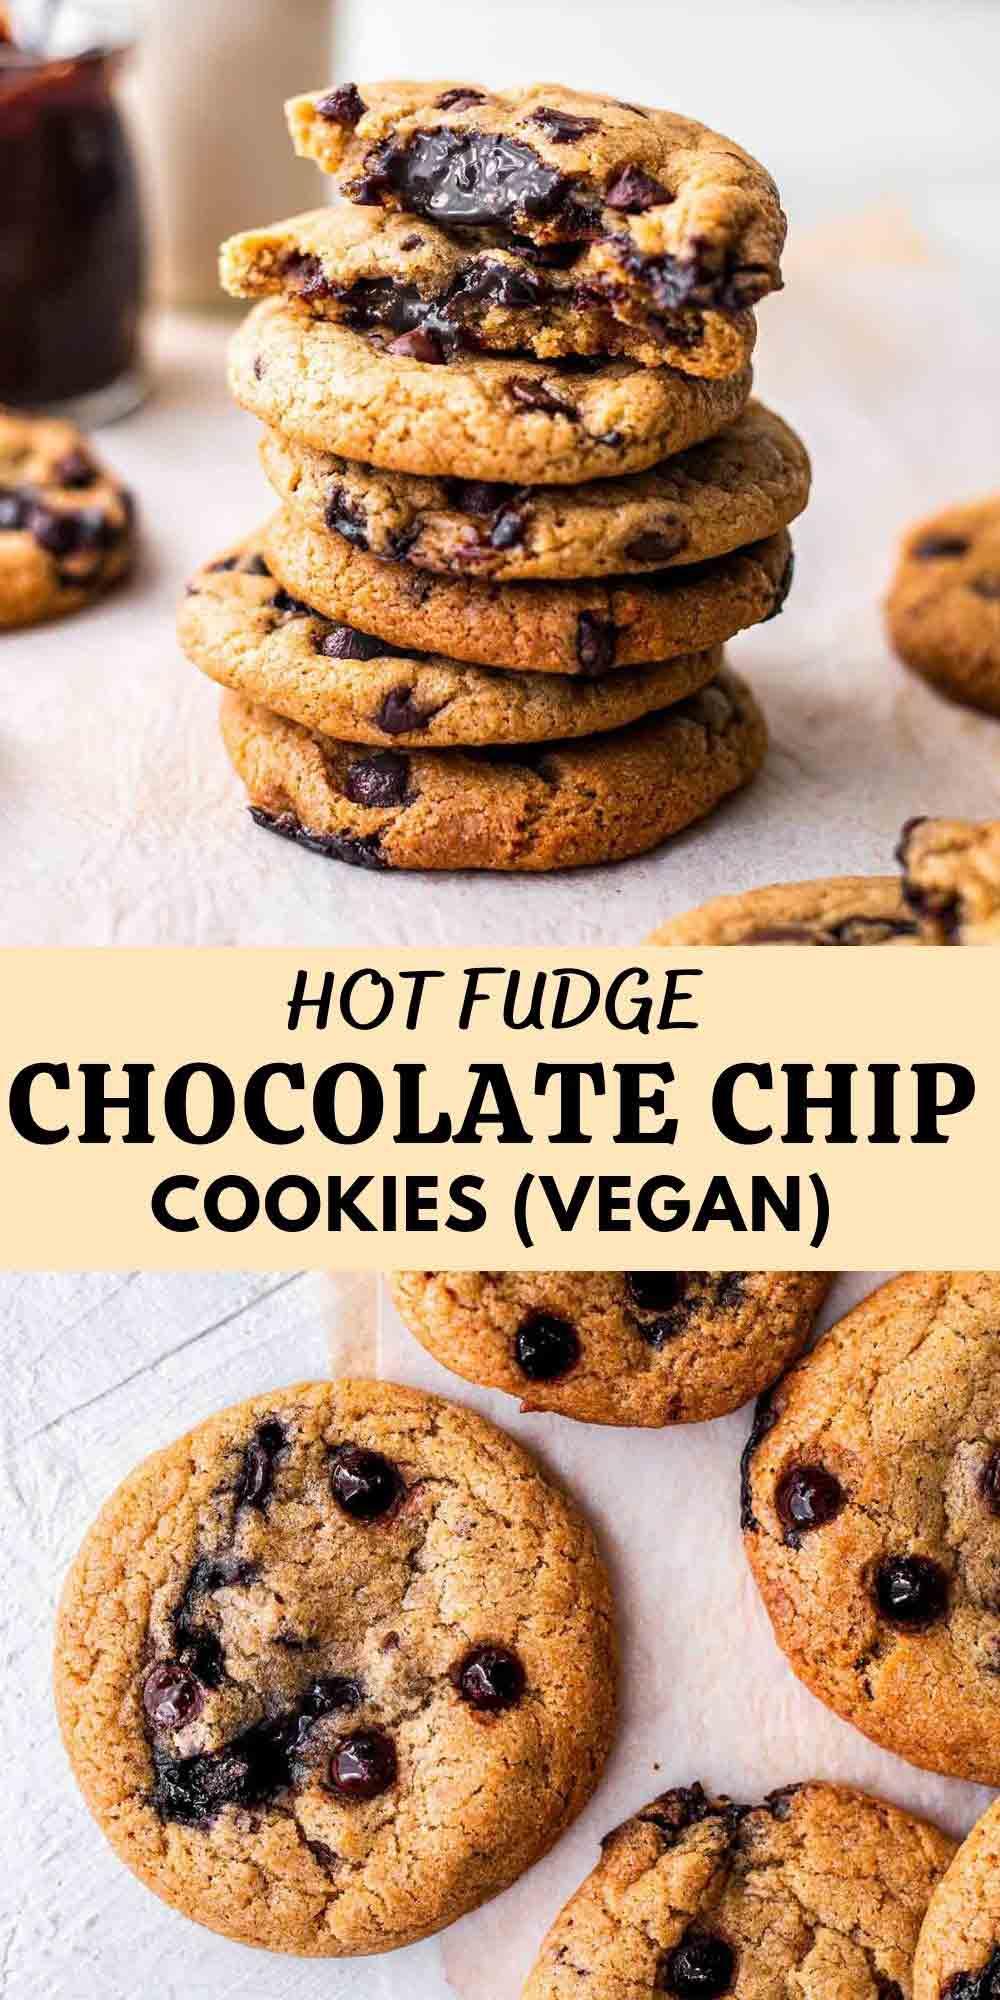 Fudge stuffed chocolate chip cookies (vegan)